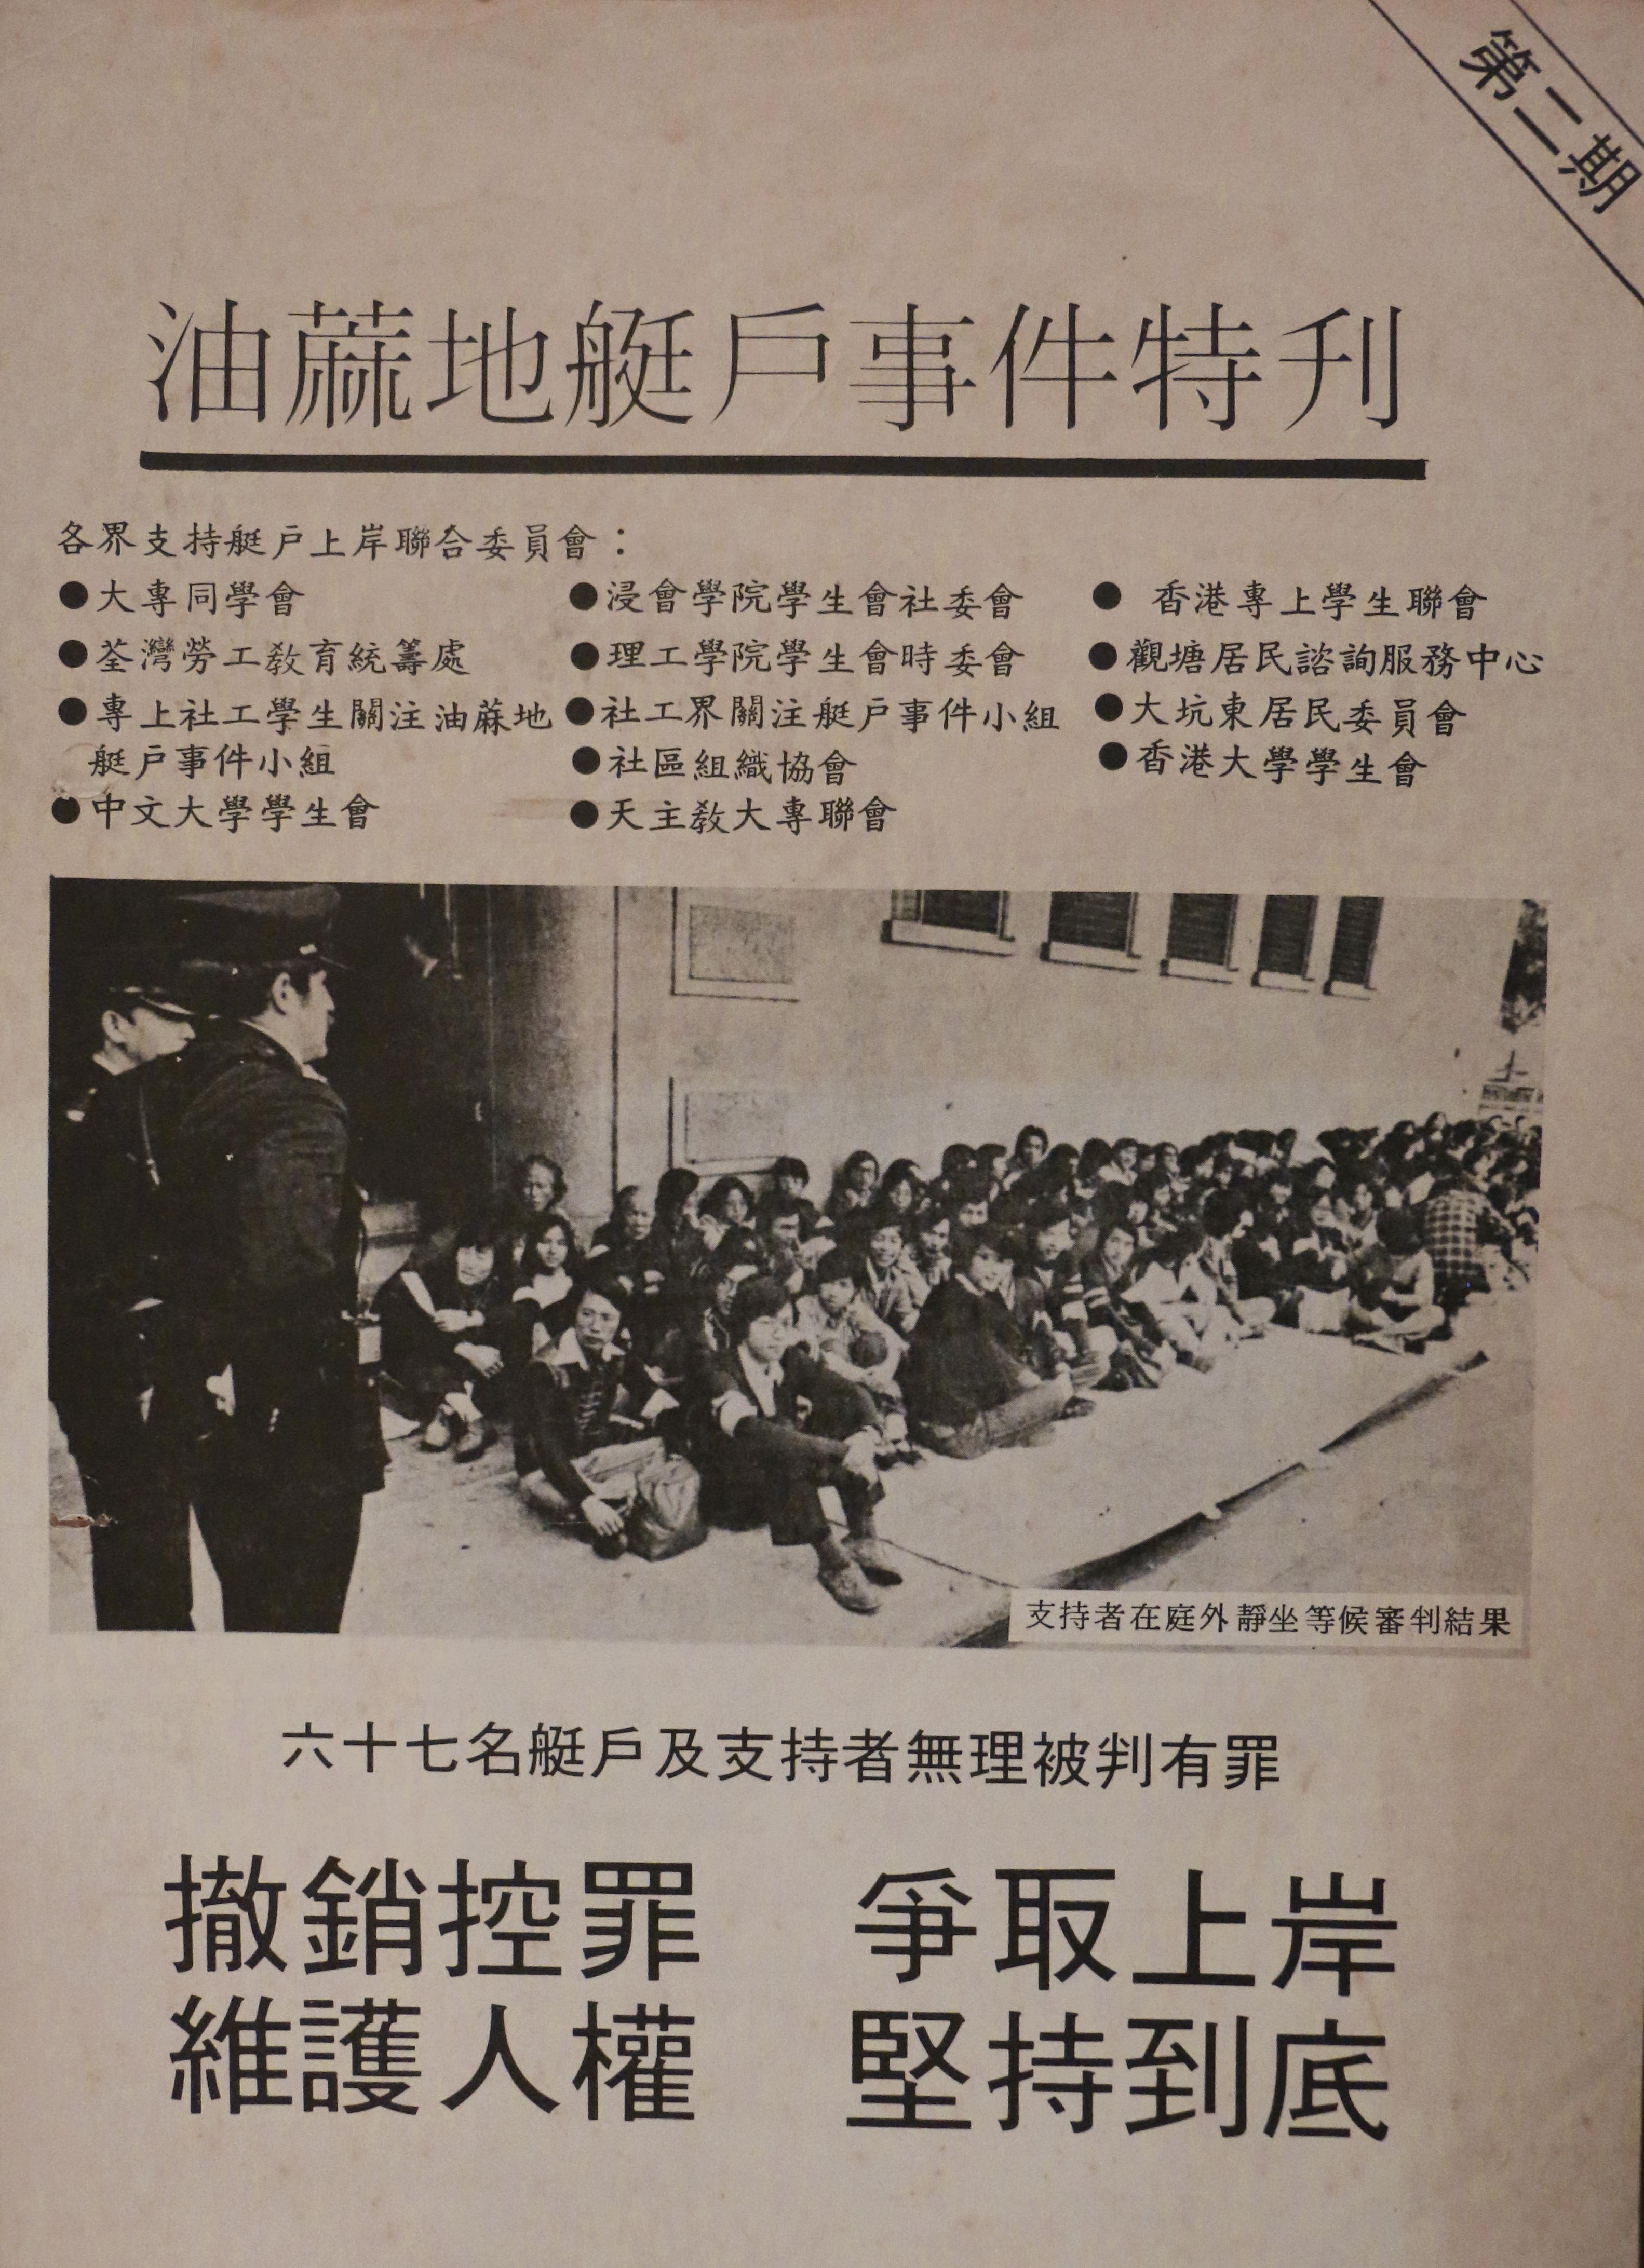 http://ubeat.com.cuhk.edu.hk/wp-content/uploads/2018/134_history_slider_8.jpg